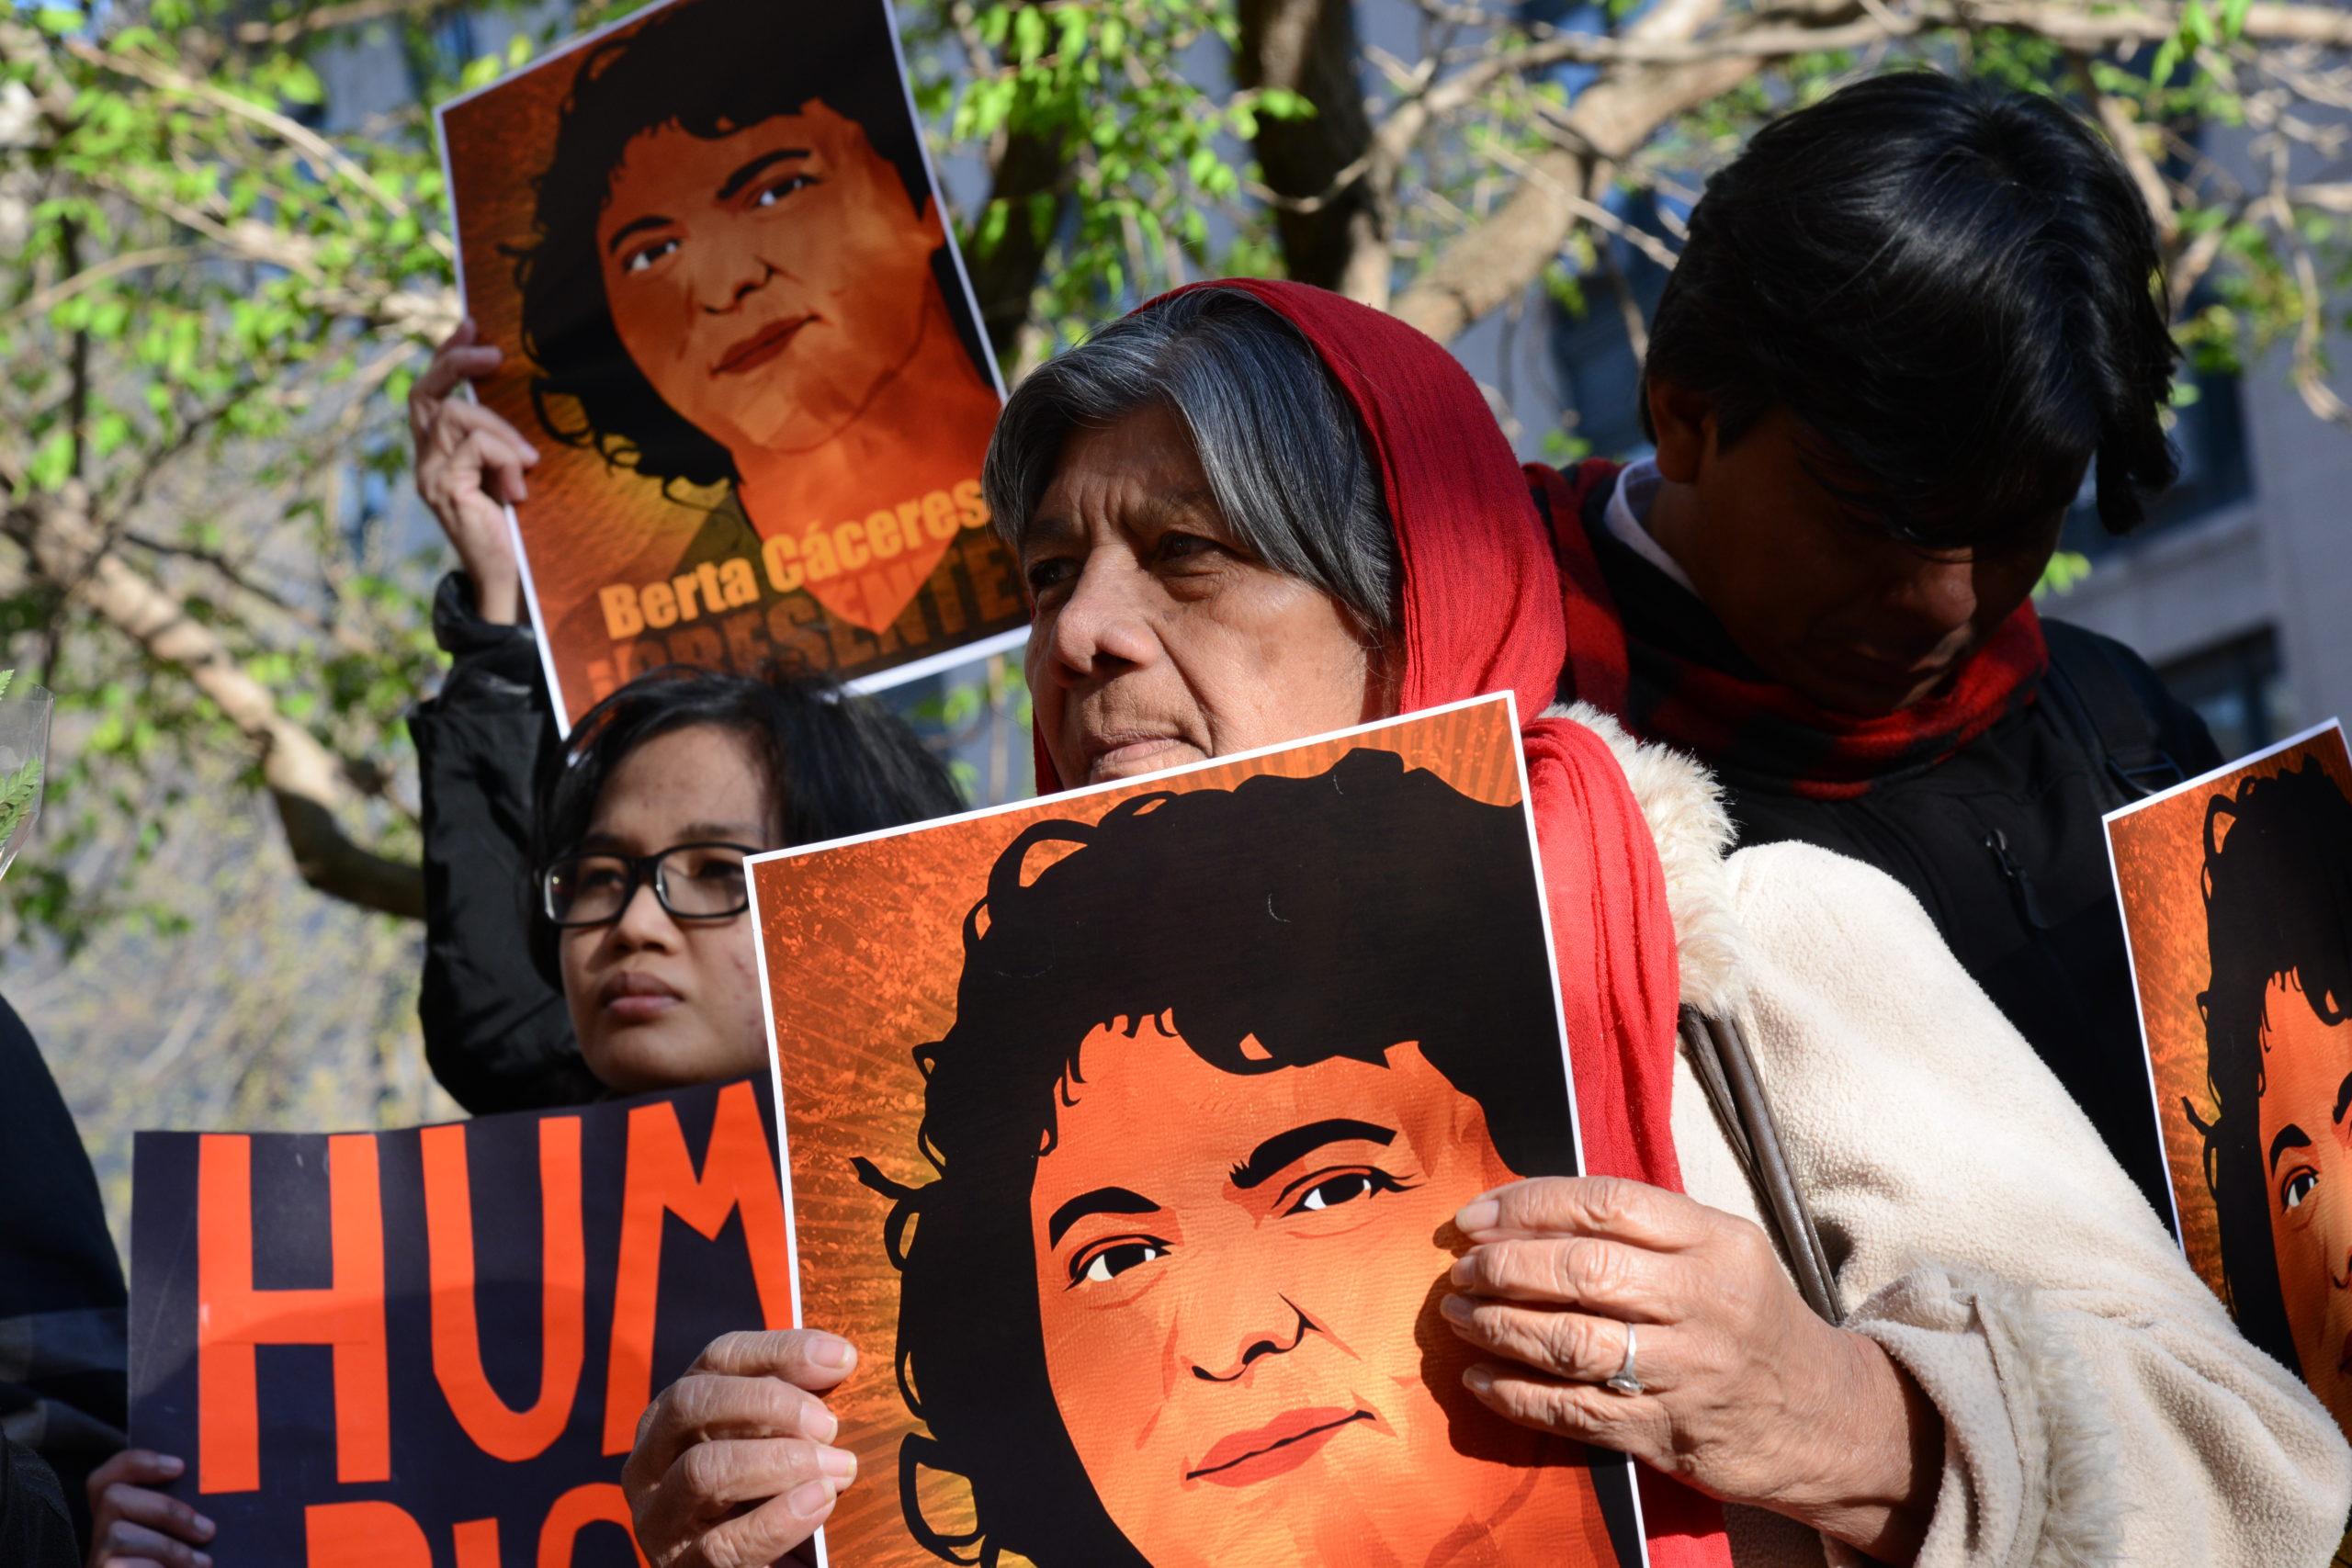 Vigil Berta Cáceres